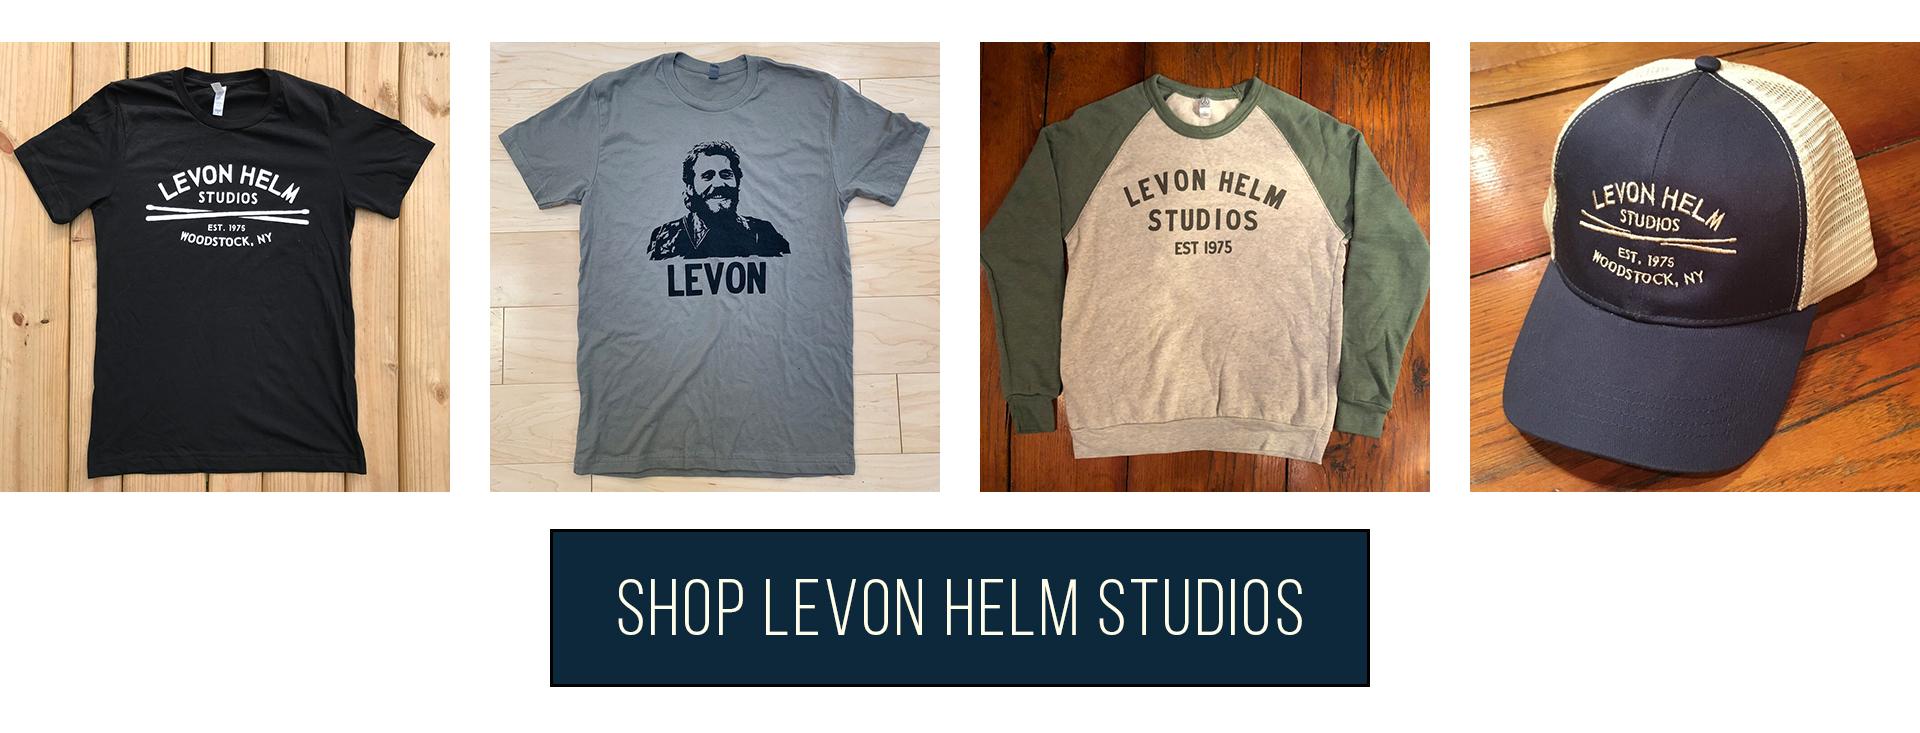 Levon Helm Studios Merch